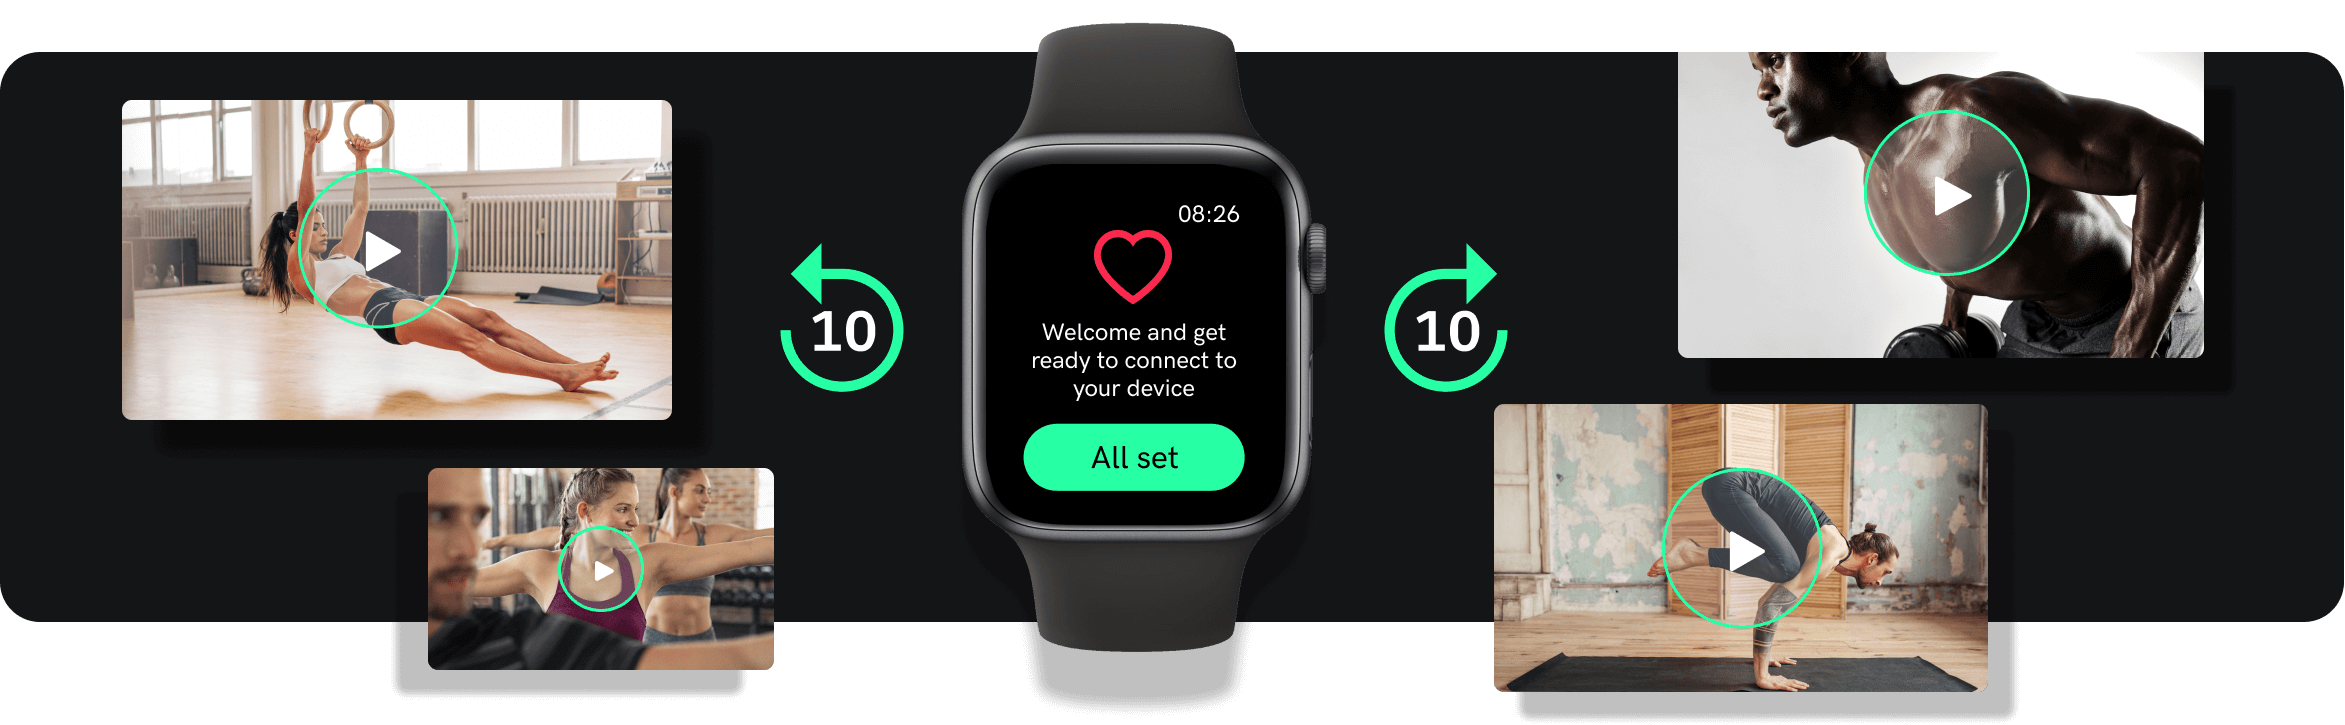 Apple Watch Fitness Tracker integration